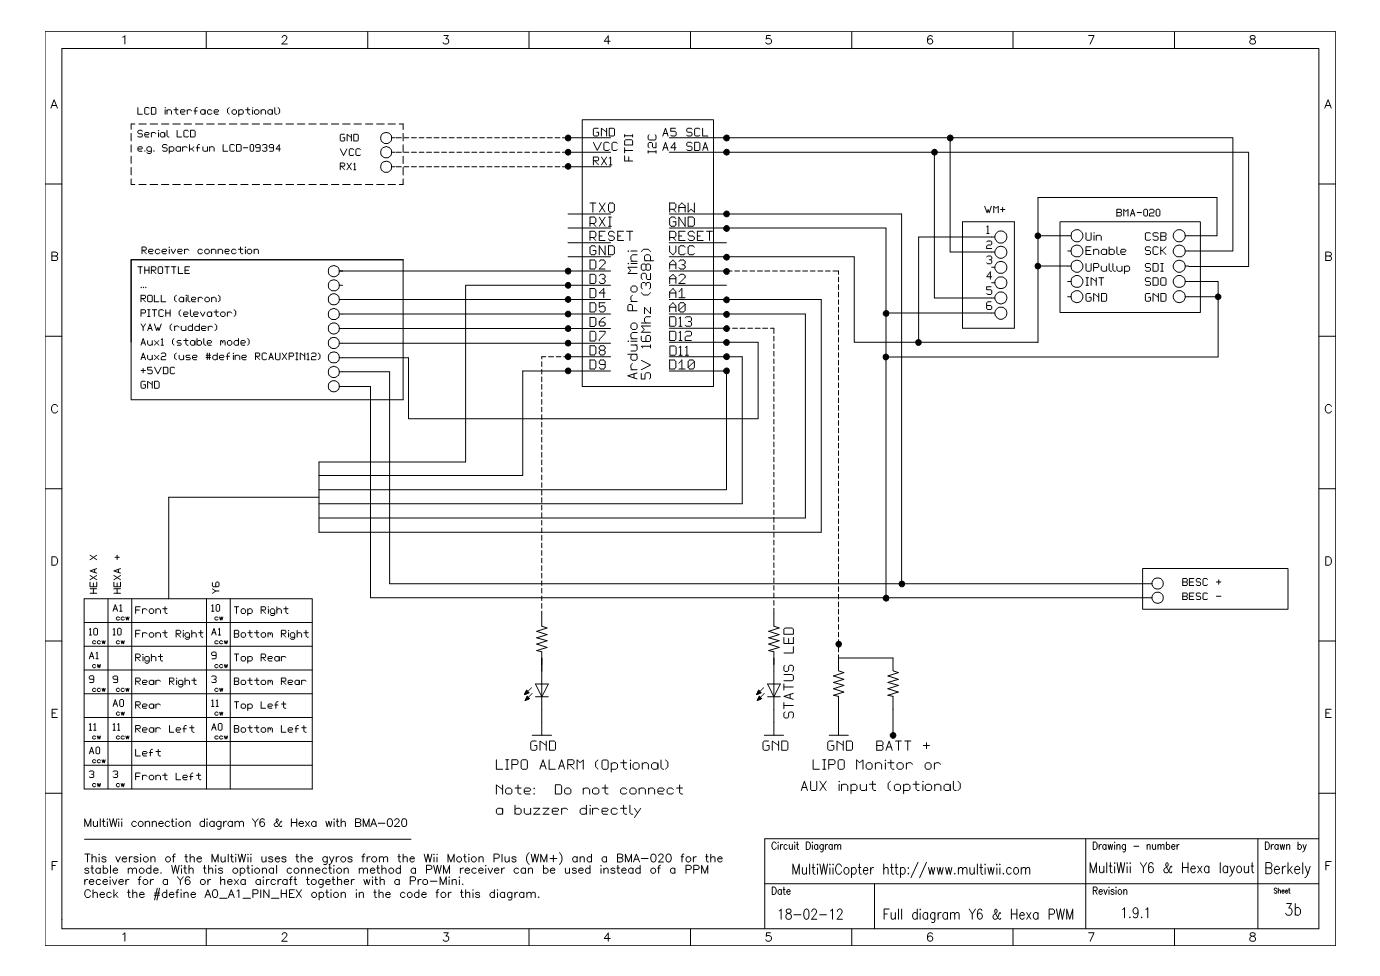 3B Full connection diagram Y6 & Hexa PPM